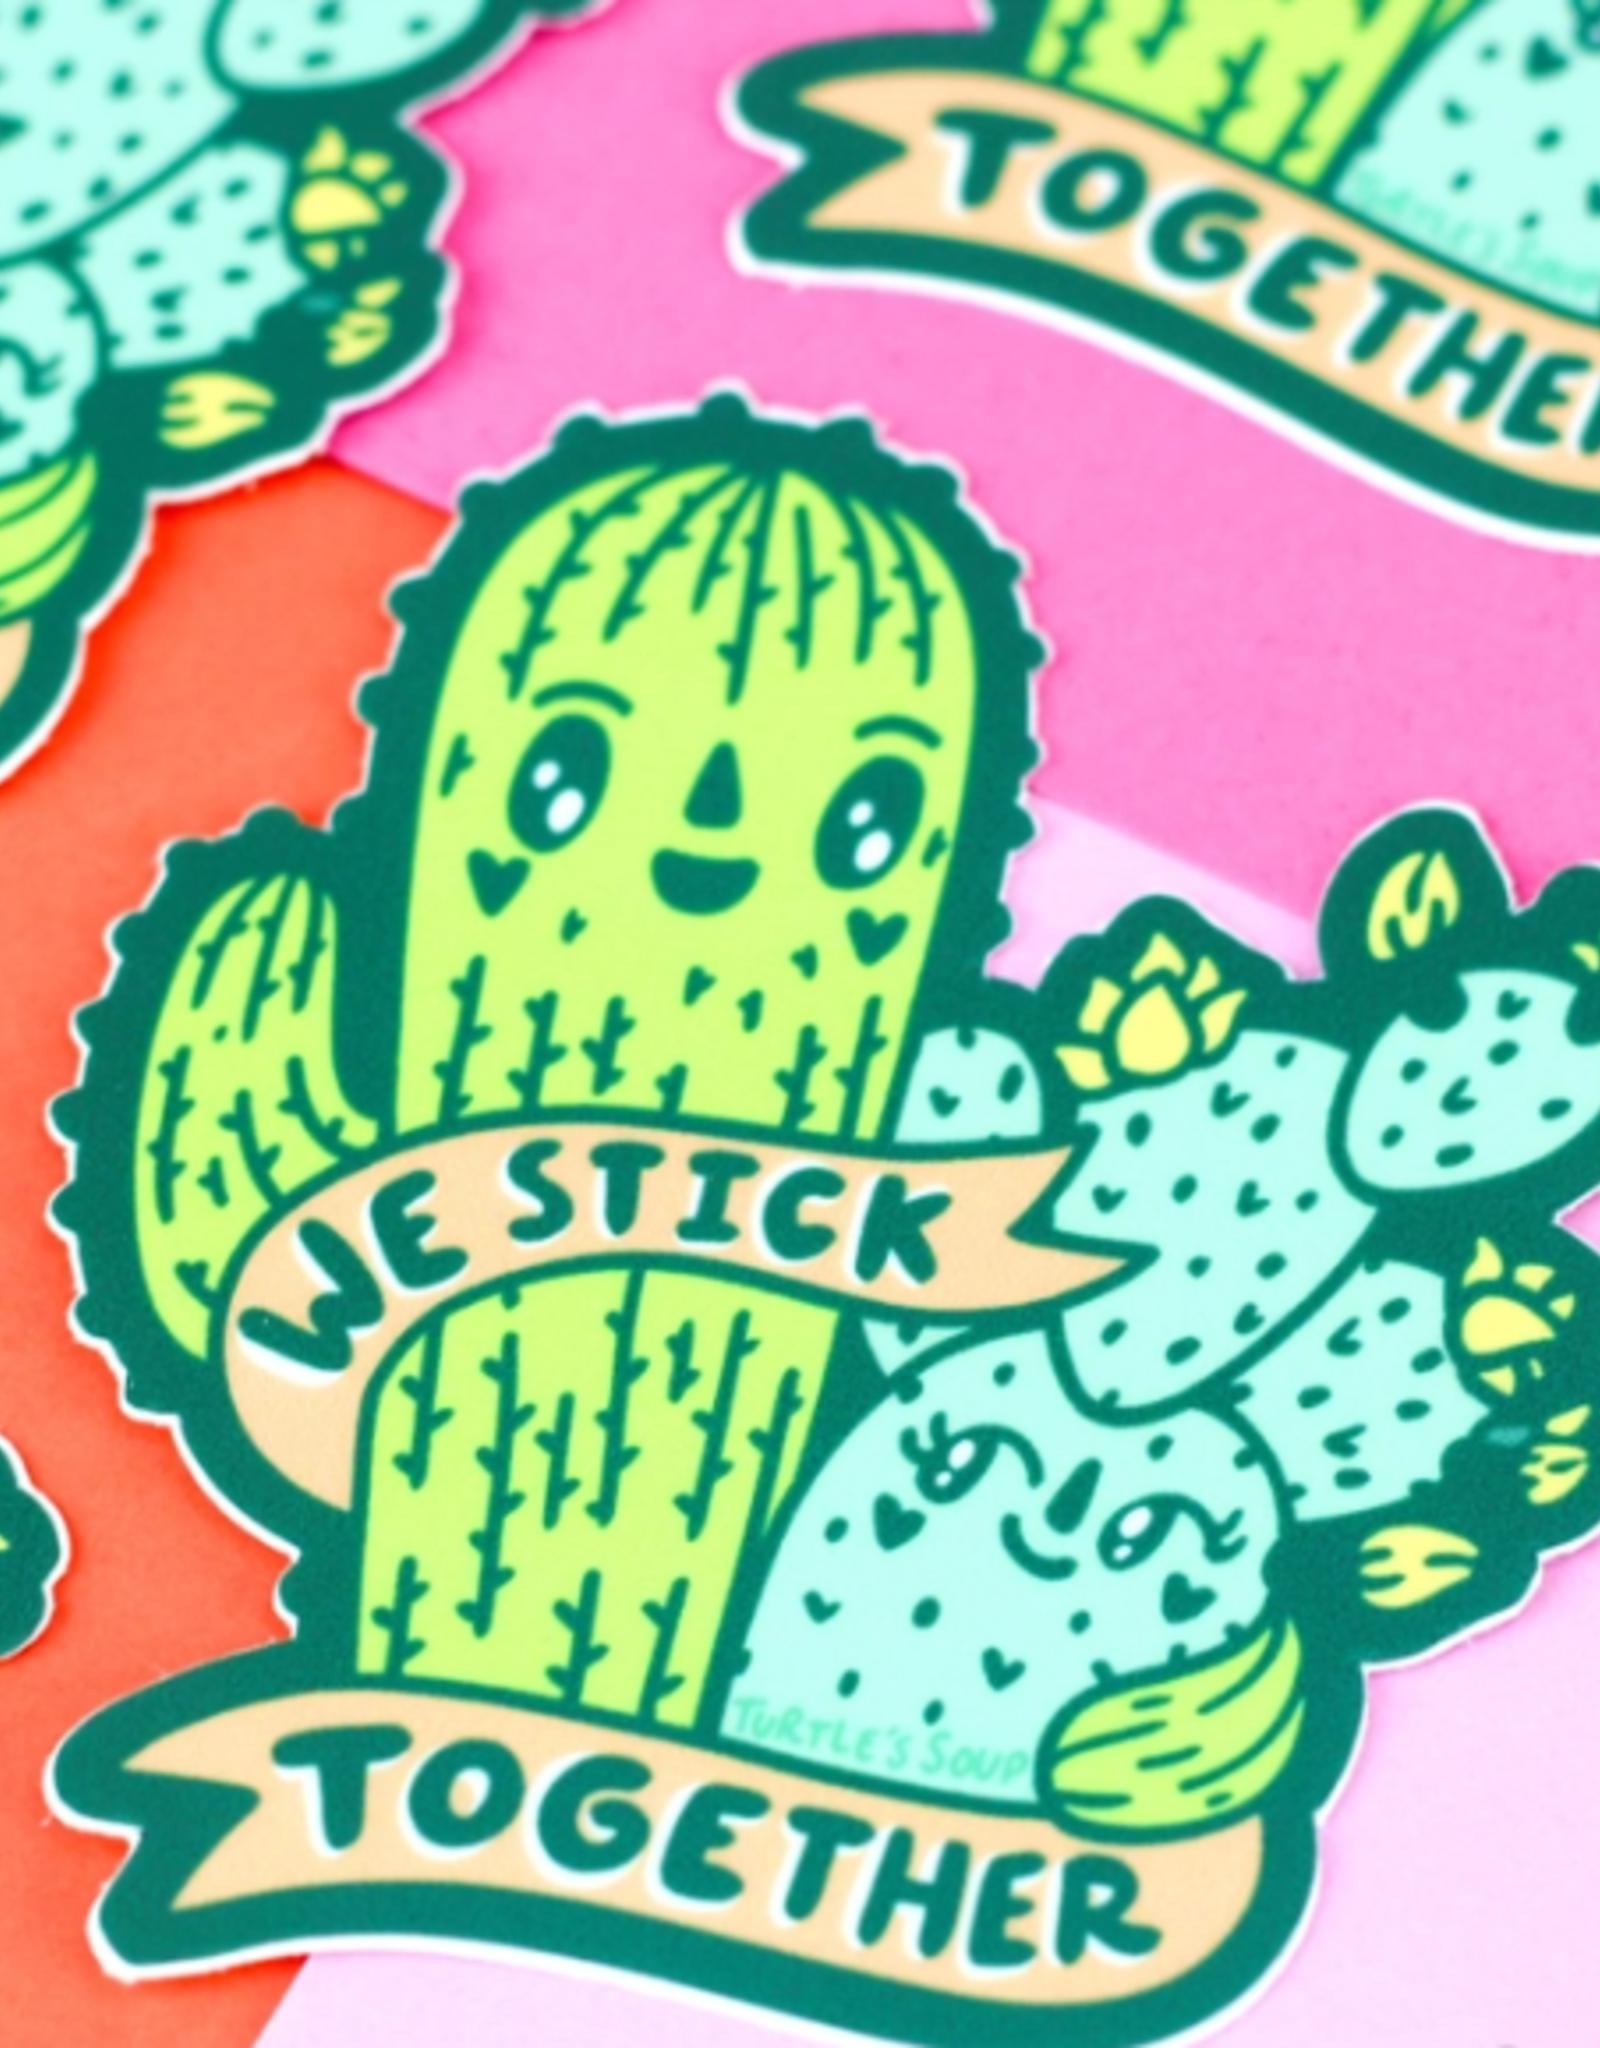 Turtle's Soup We Stick Together Cacti Vinyl Sticker